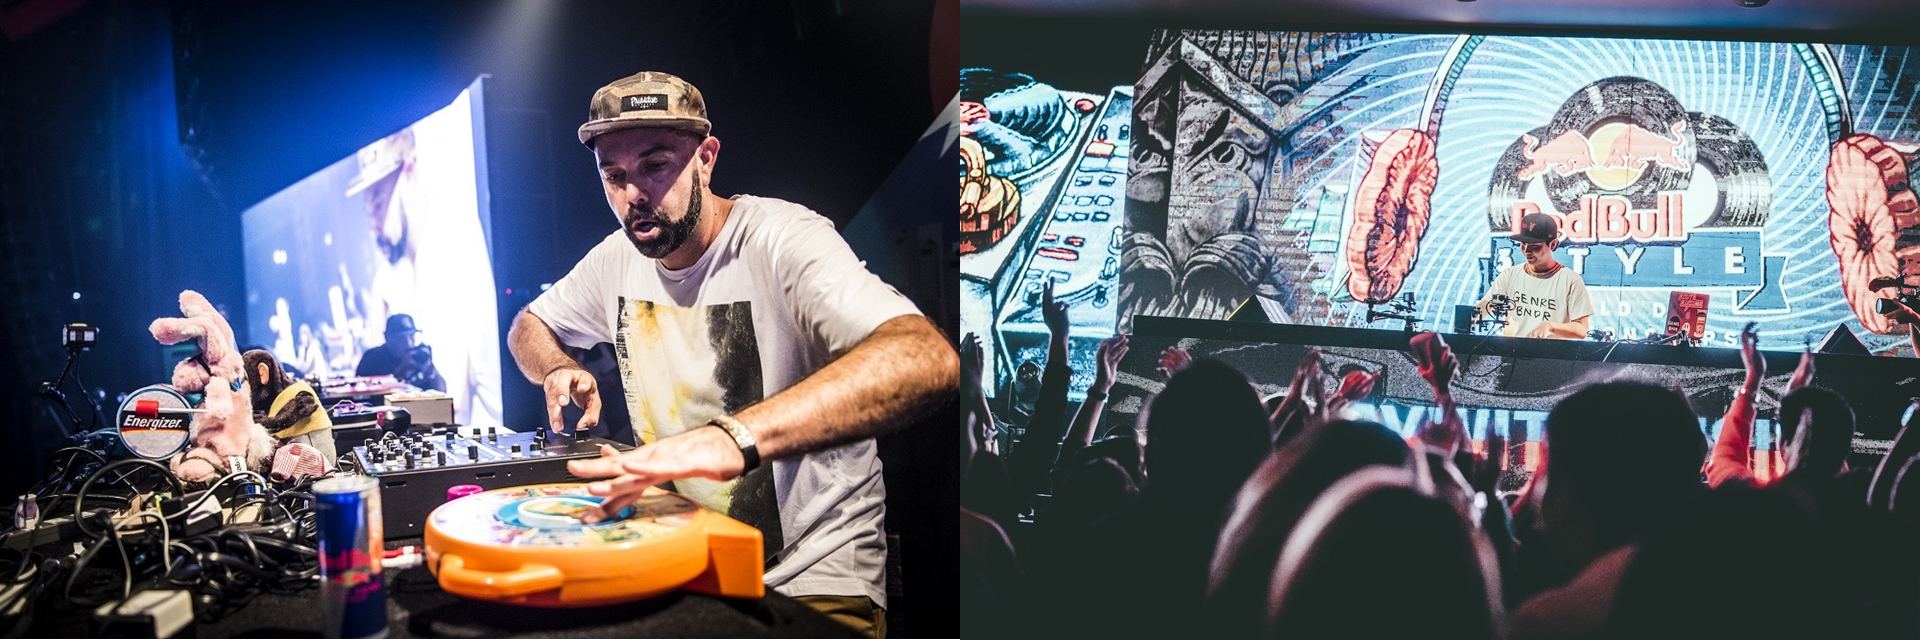 DJ刷盤也能做PIZZA?!這才是真正的「玩」音樂,比你想像的還要狂!